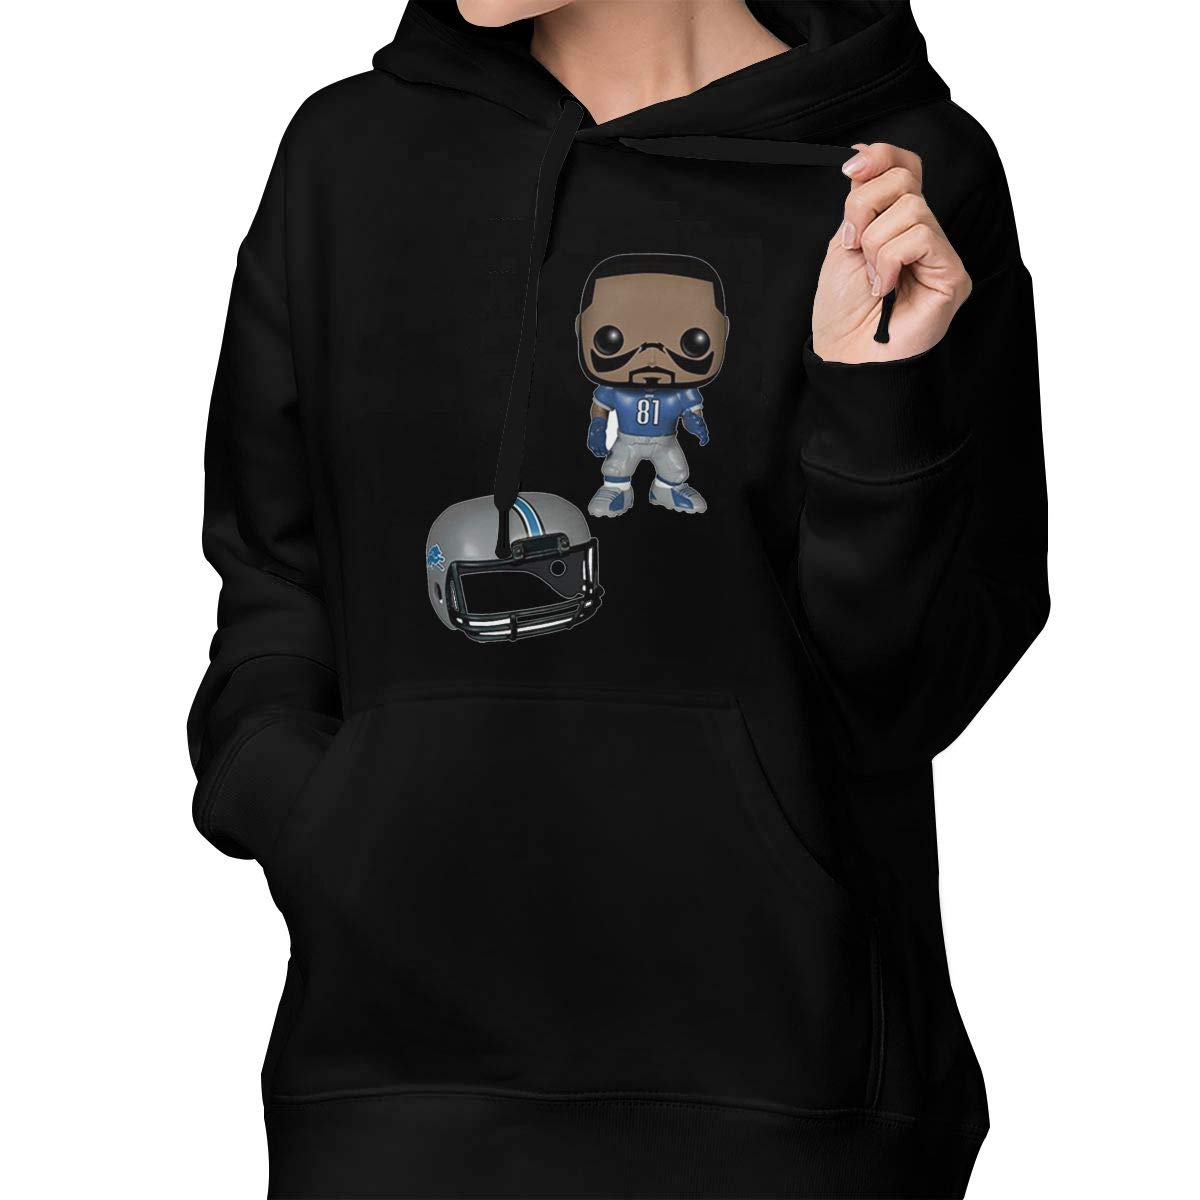 save off 6ae01 74b50 Amazon.com: Women's Drew-Brees -NFL Fashion Hooded ...